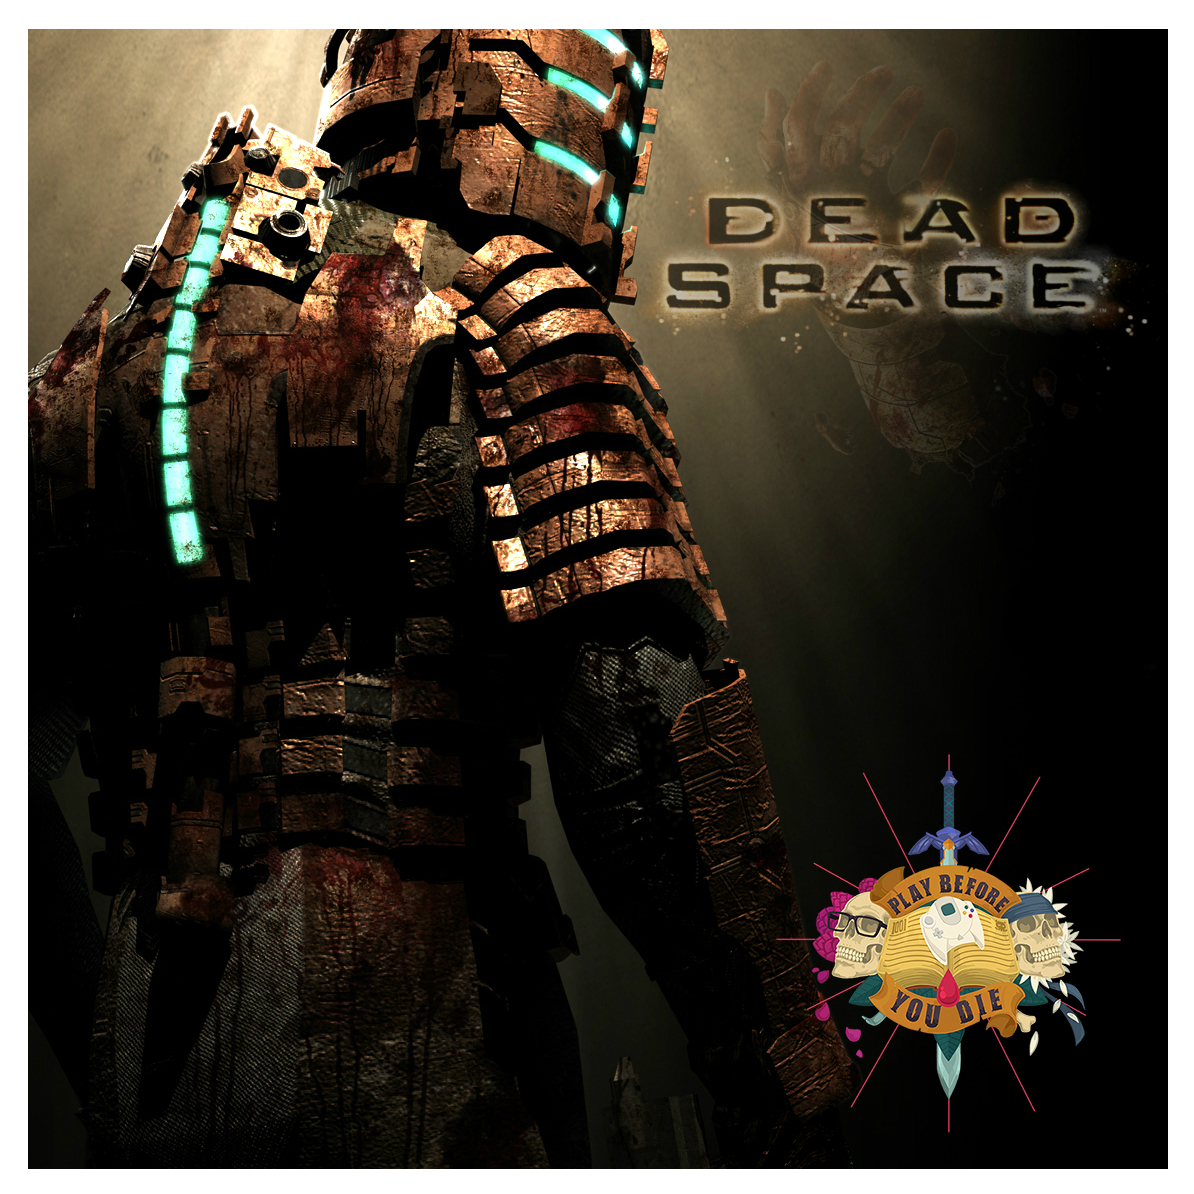 Dead Space v.2